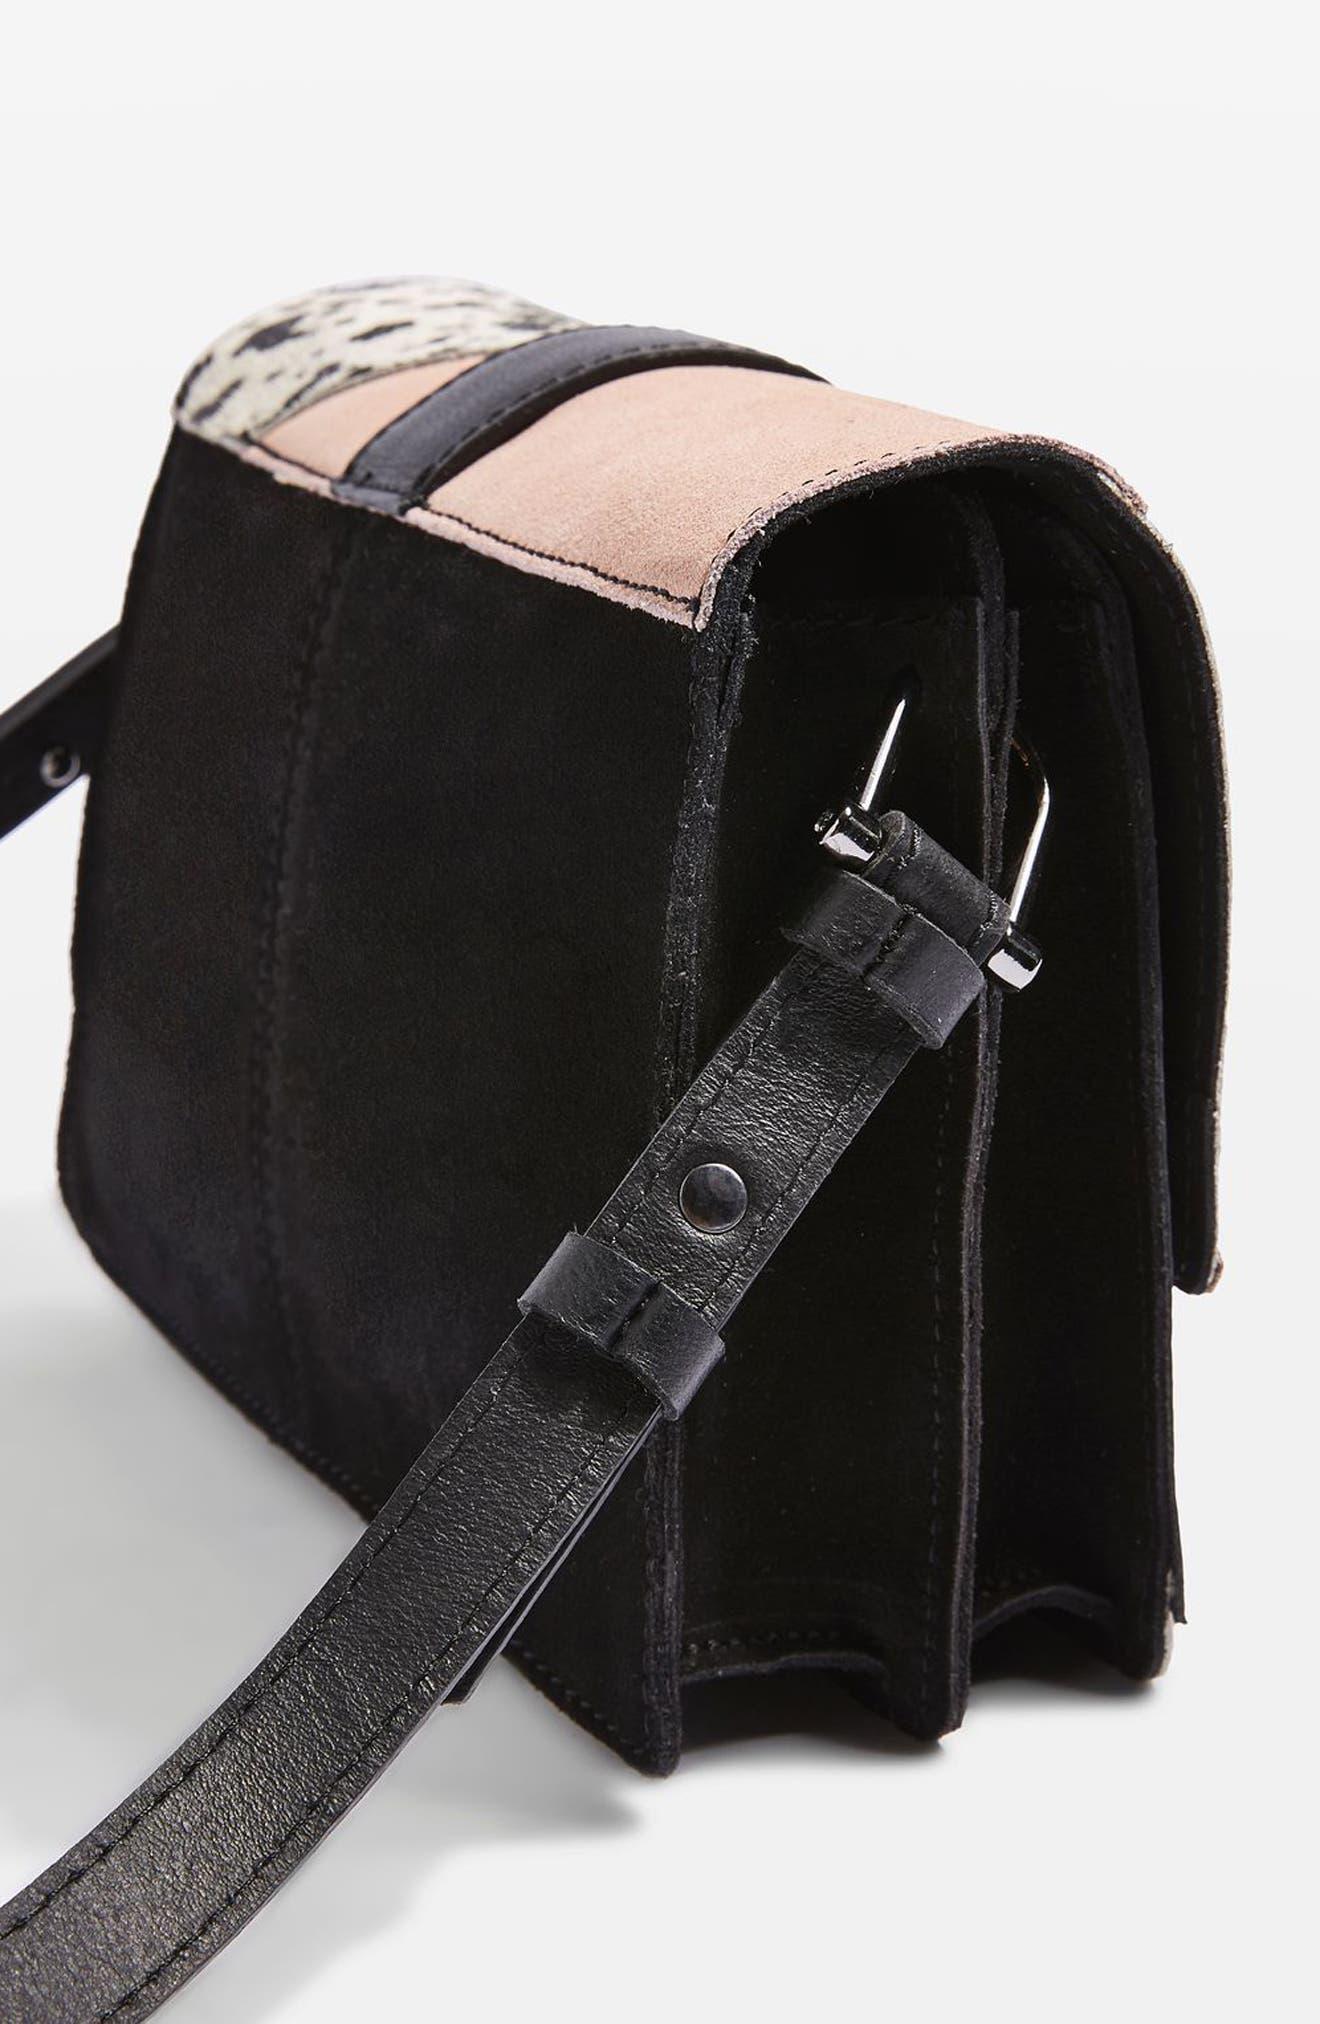 Premium Leather & Genuine Calf Hair Patchwork Crossbody Bag,                             Alternate thumbnail 3, color,                             Black Multi